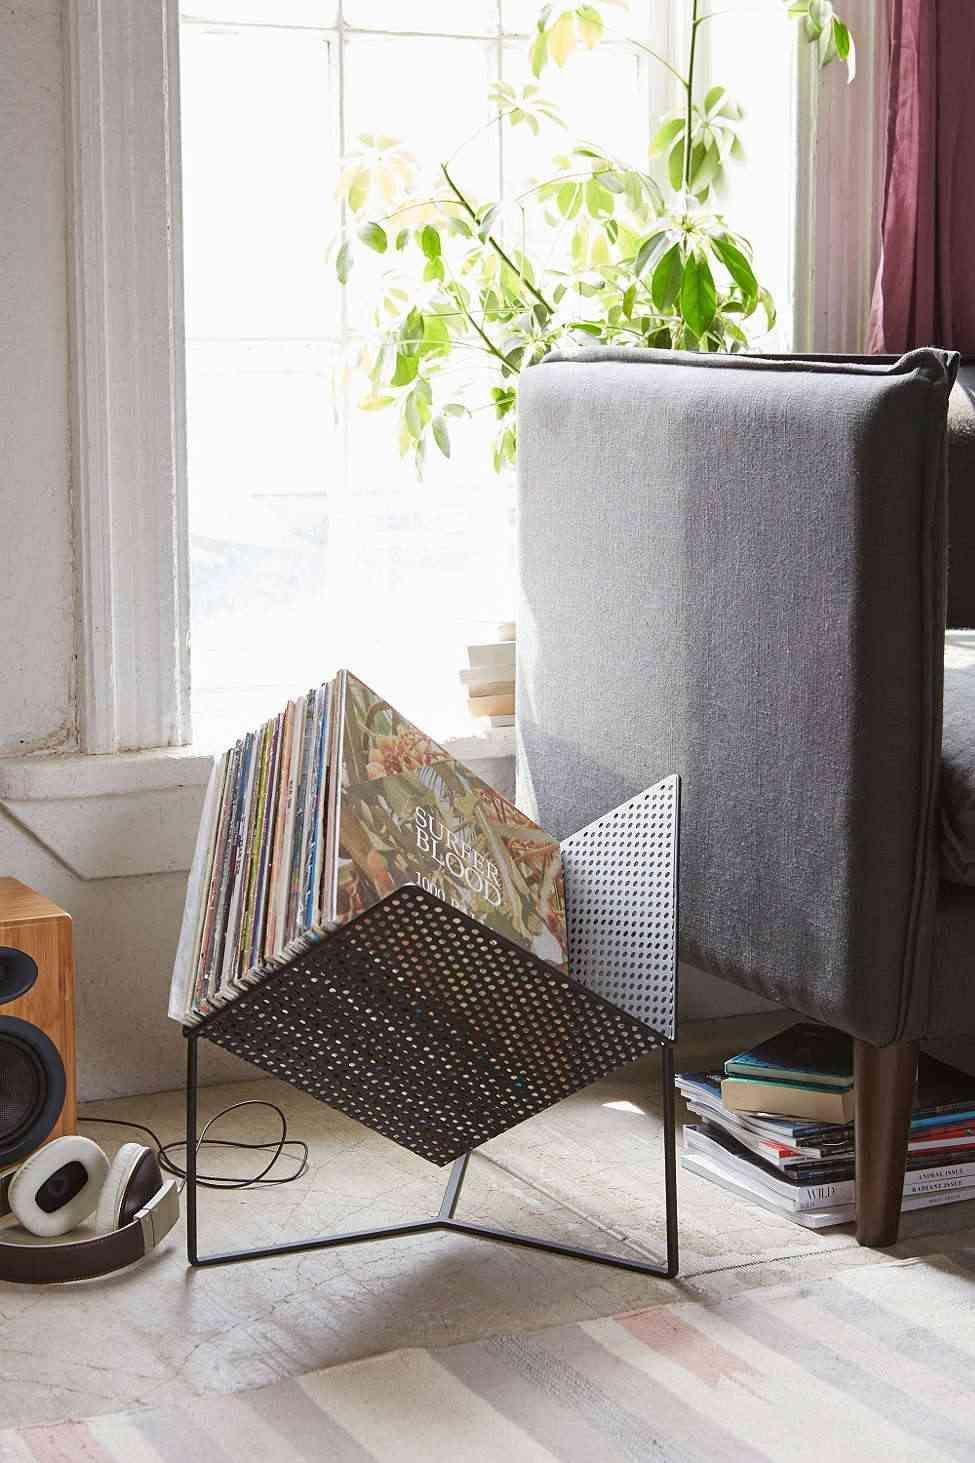 rangement vinyle fonctionnel et l gant en 35 id es inspirantes pinterest vinyl und schr nkchen. Black Bedroom Furniture Sets. Home Design Ideas